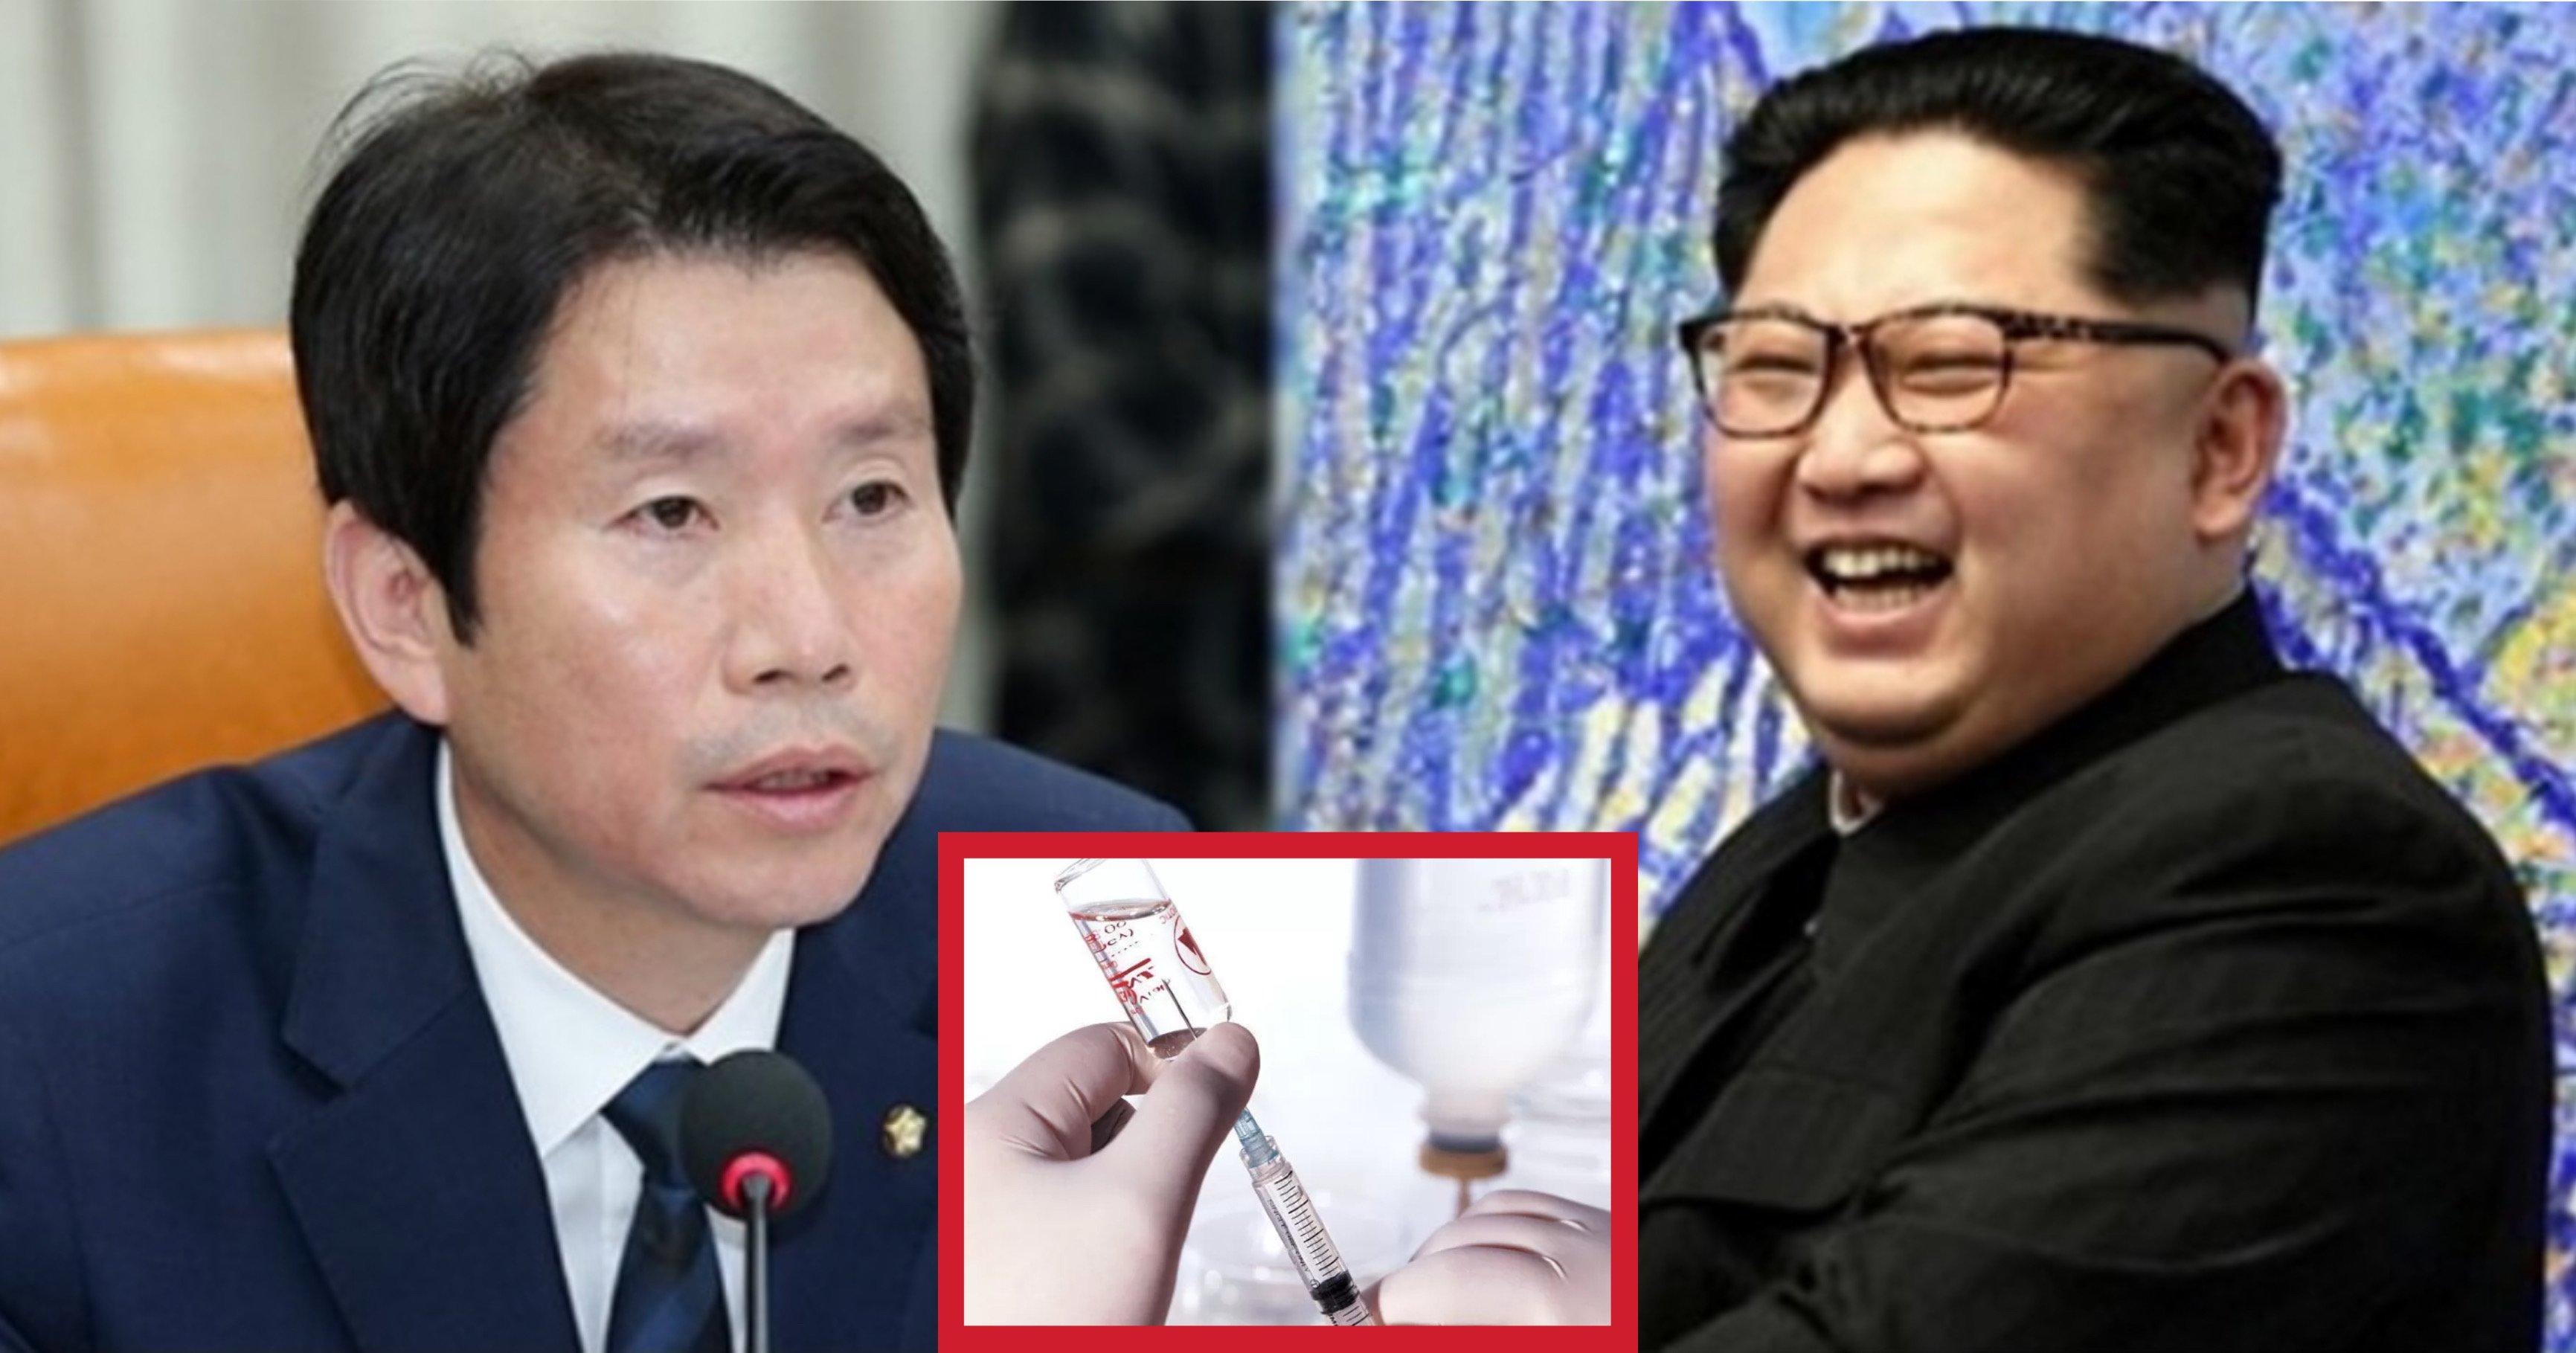 "ad5695e6 2349 47d7 831e 5cdc84edb381.jpeg?resize=412,232 - 통일부 장관..""북한에 코로나 치료제 지원 검토 중"""